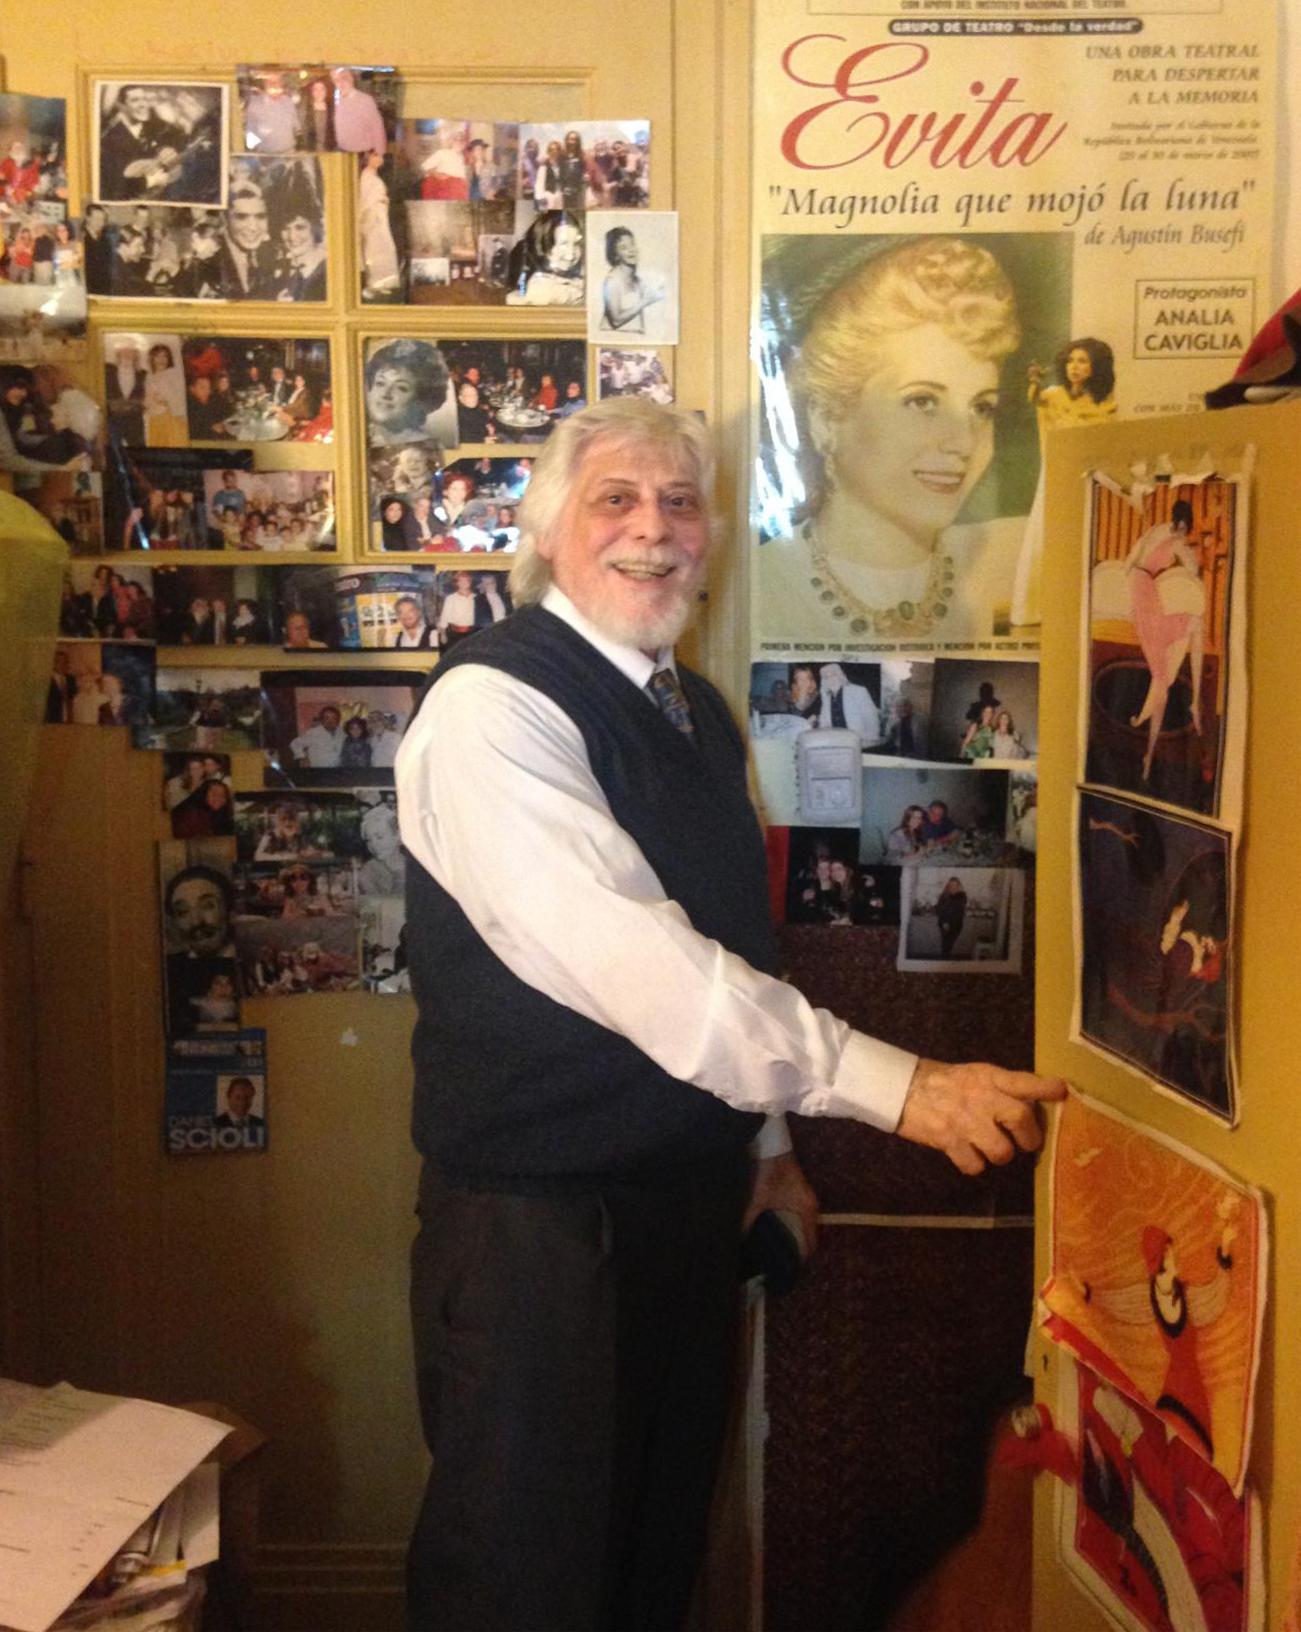 Agustin Busefi in his room. (Photo by Tara Isabella Burton)